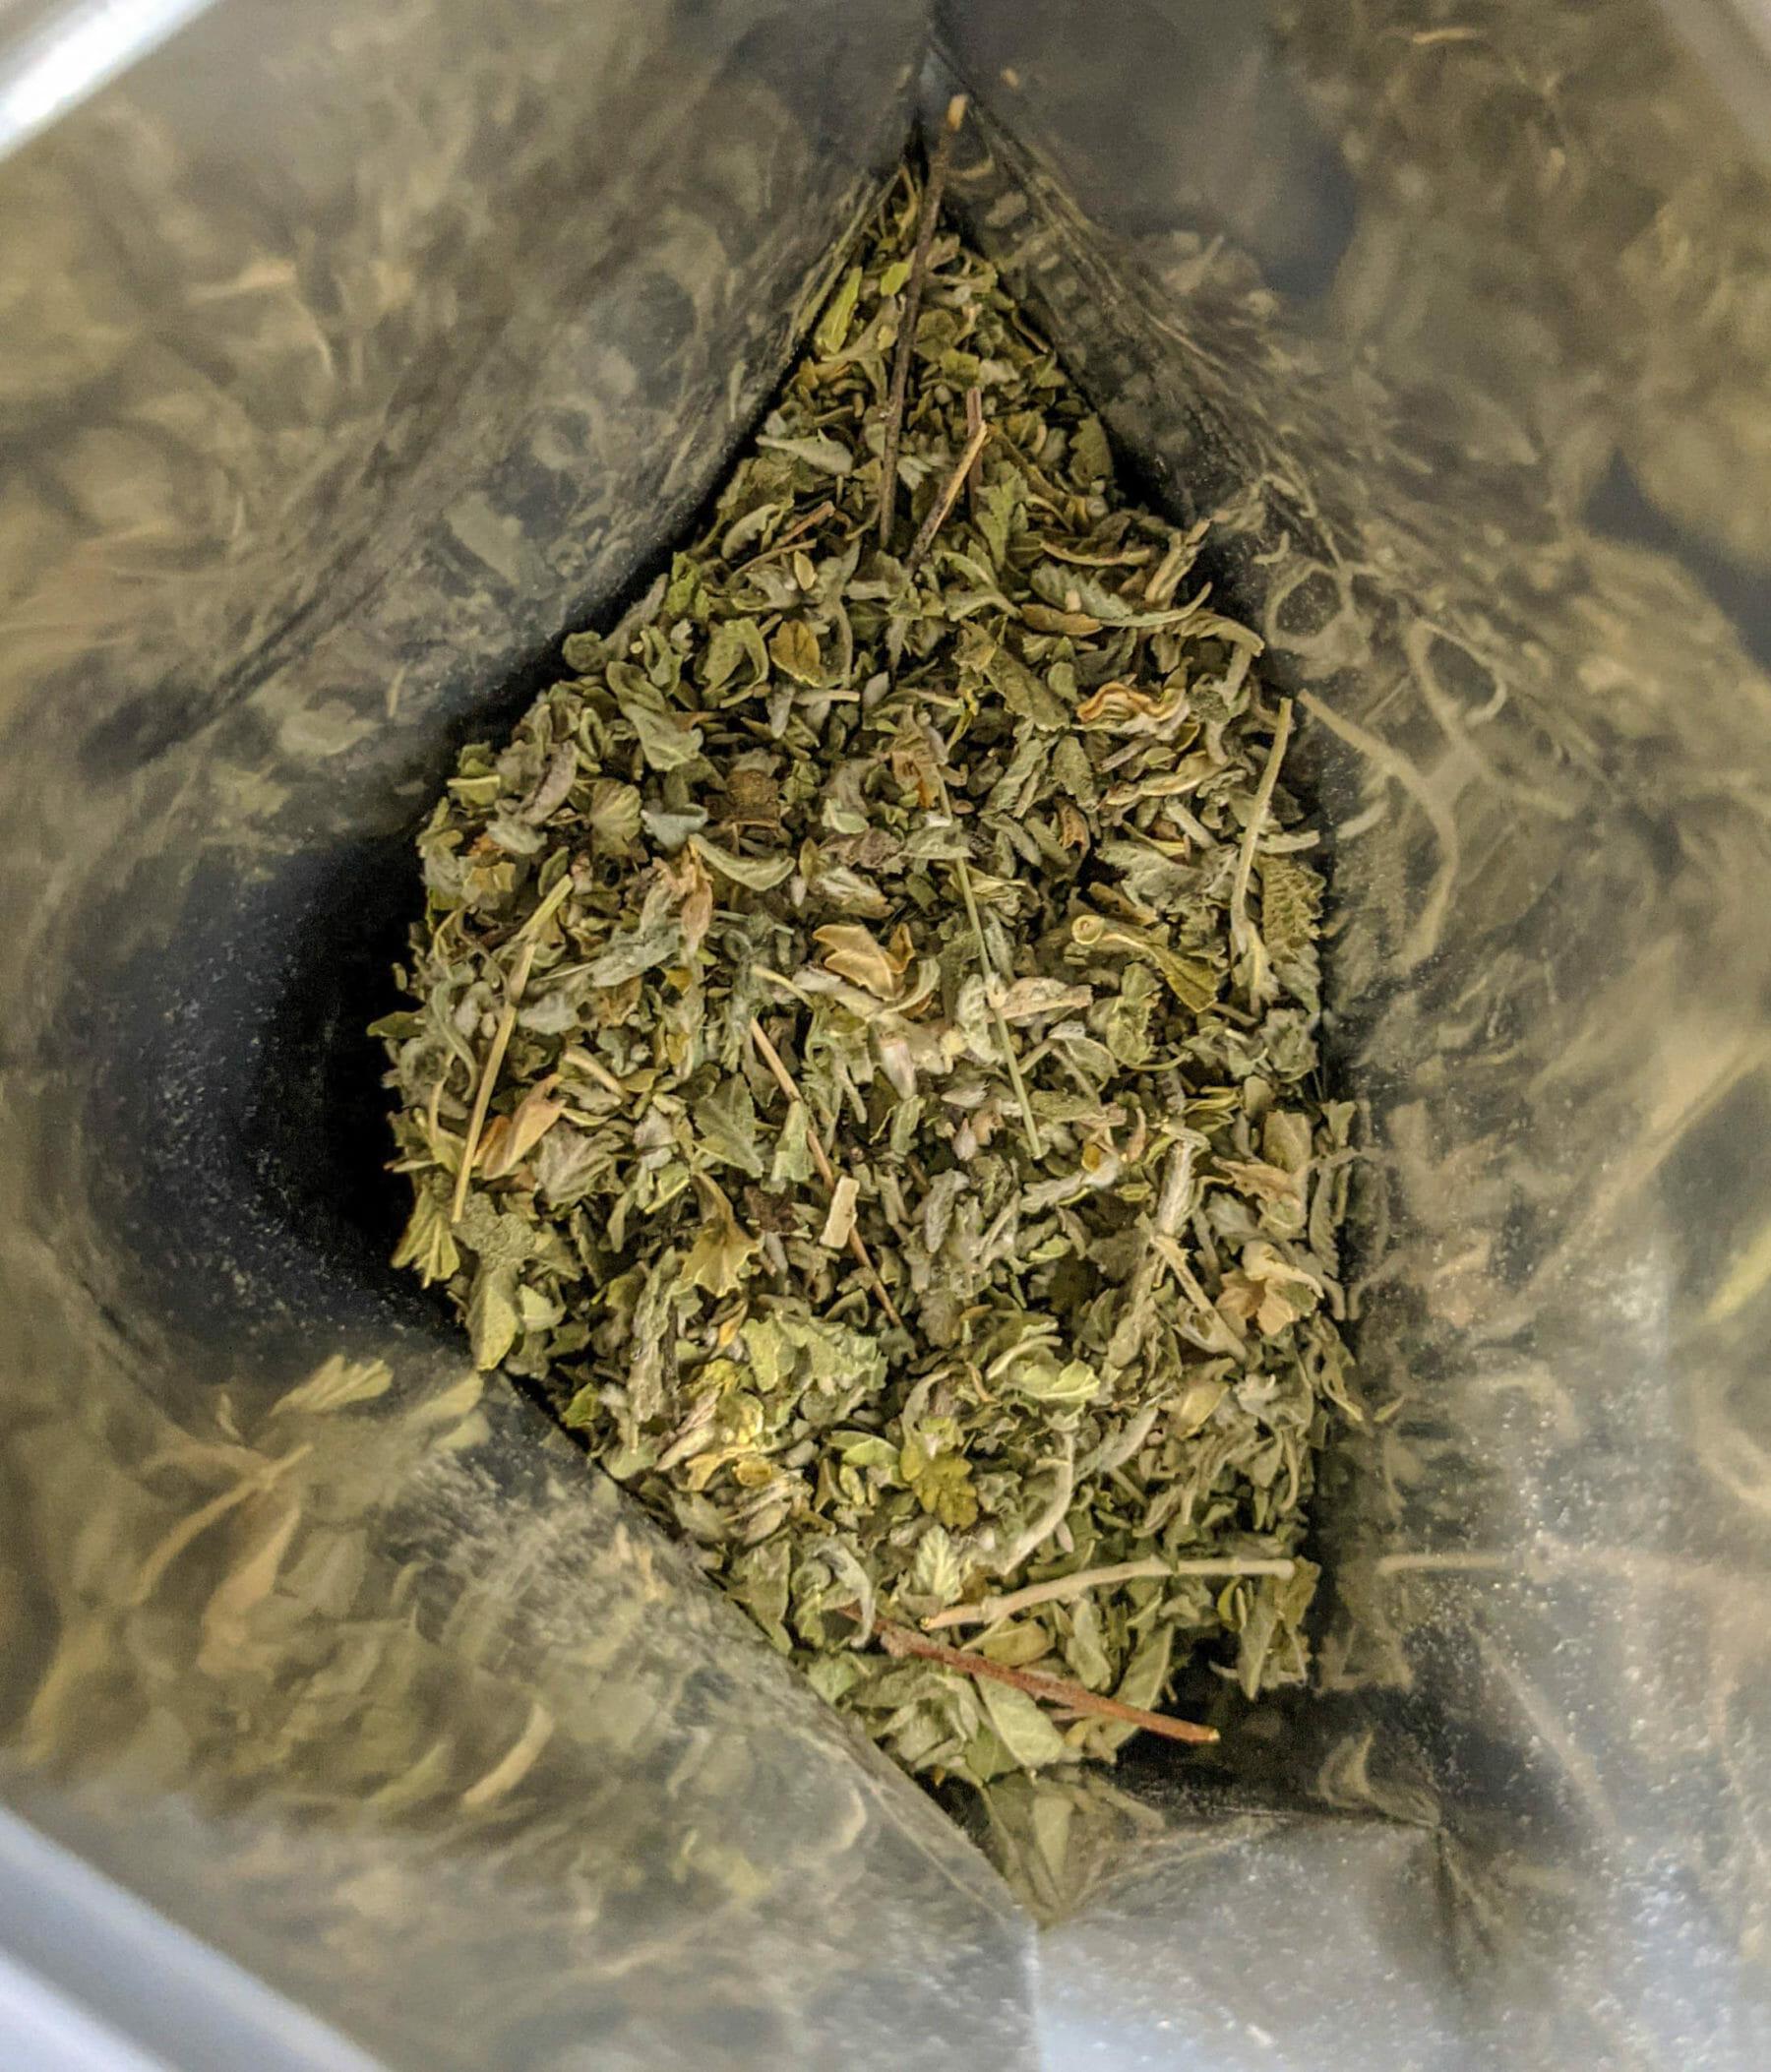 damiana inside bag